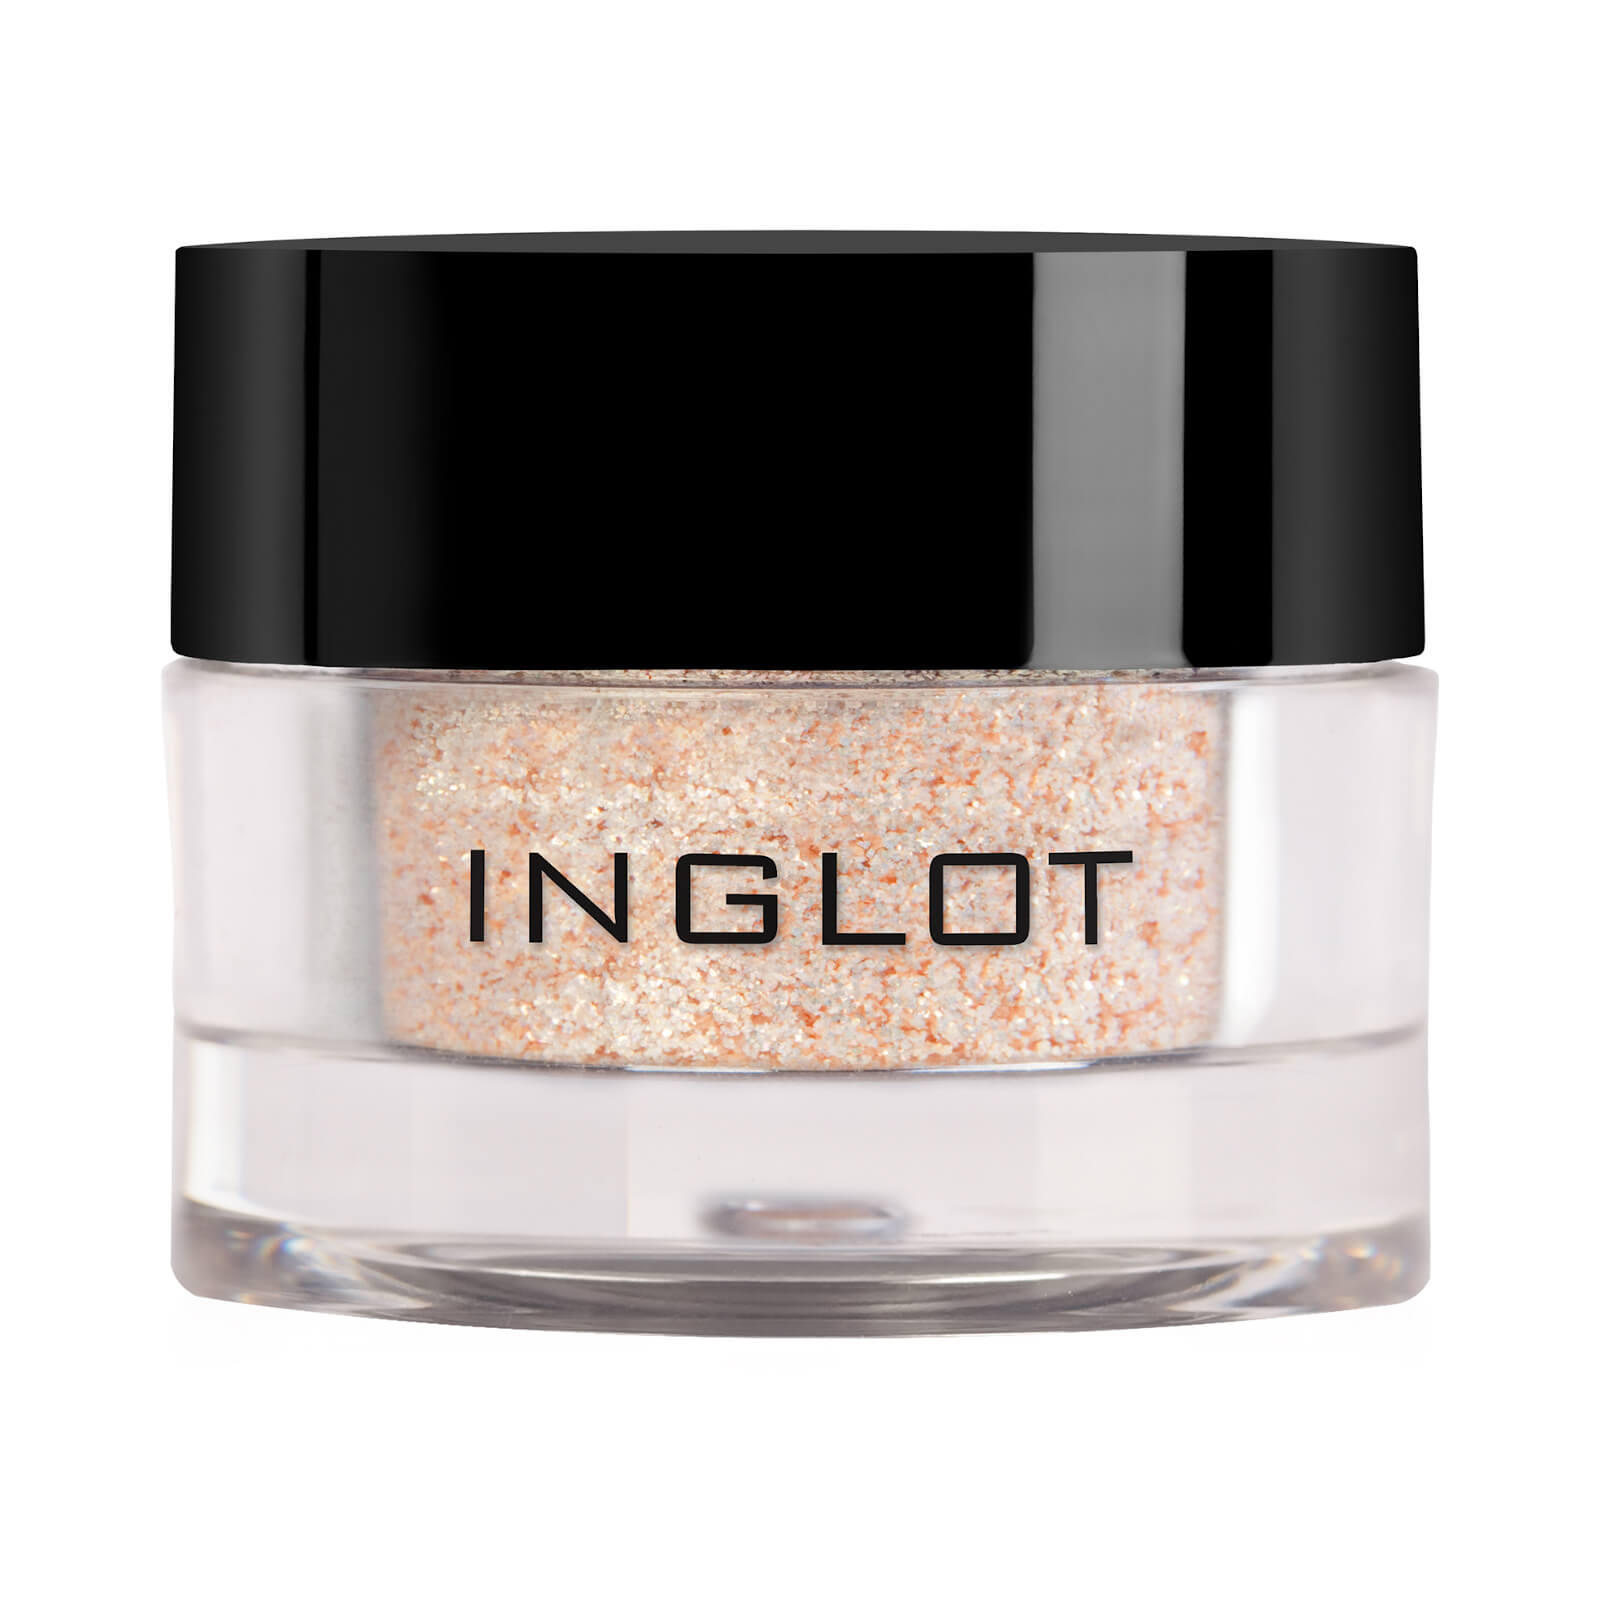 Купить Inglot Amc Pure Pigment Eye Shadow 2g (Various Shades) - 118